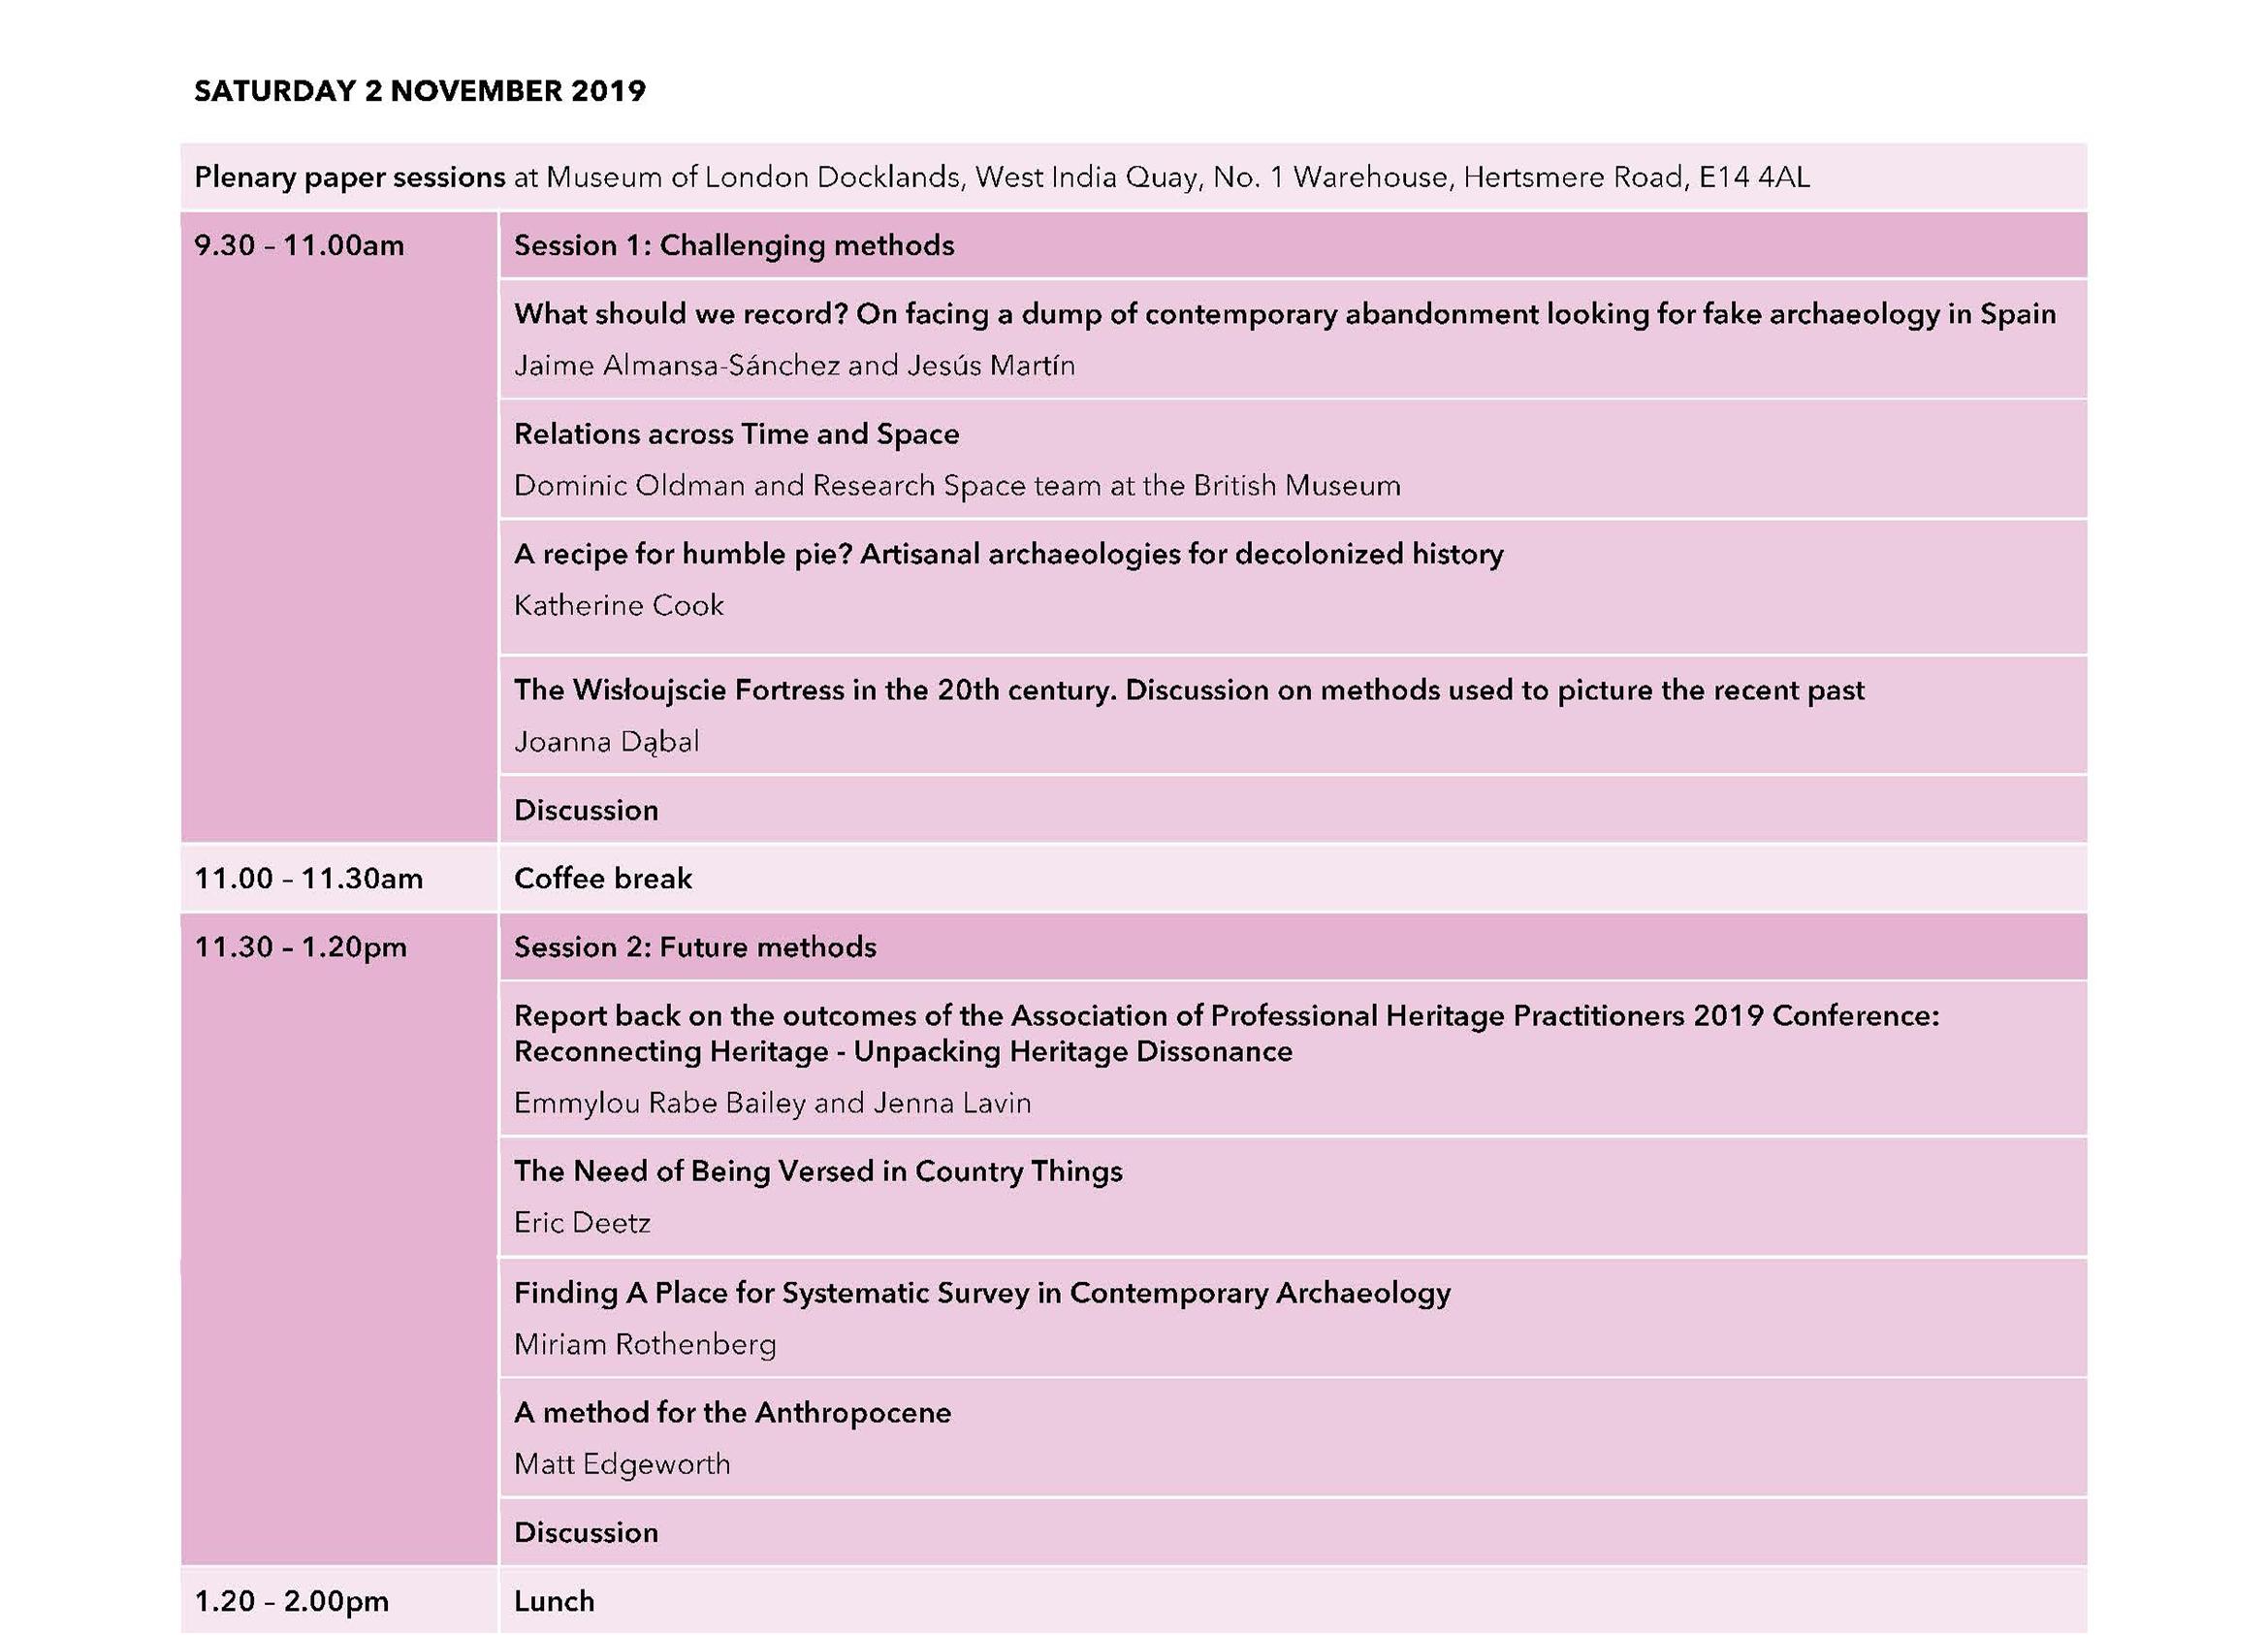 CHATmethod provisional timetable - Day 2